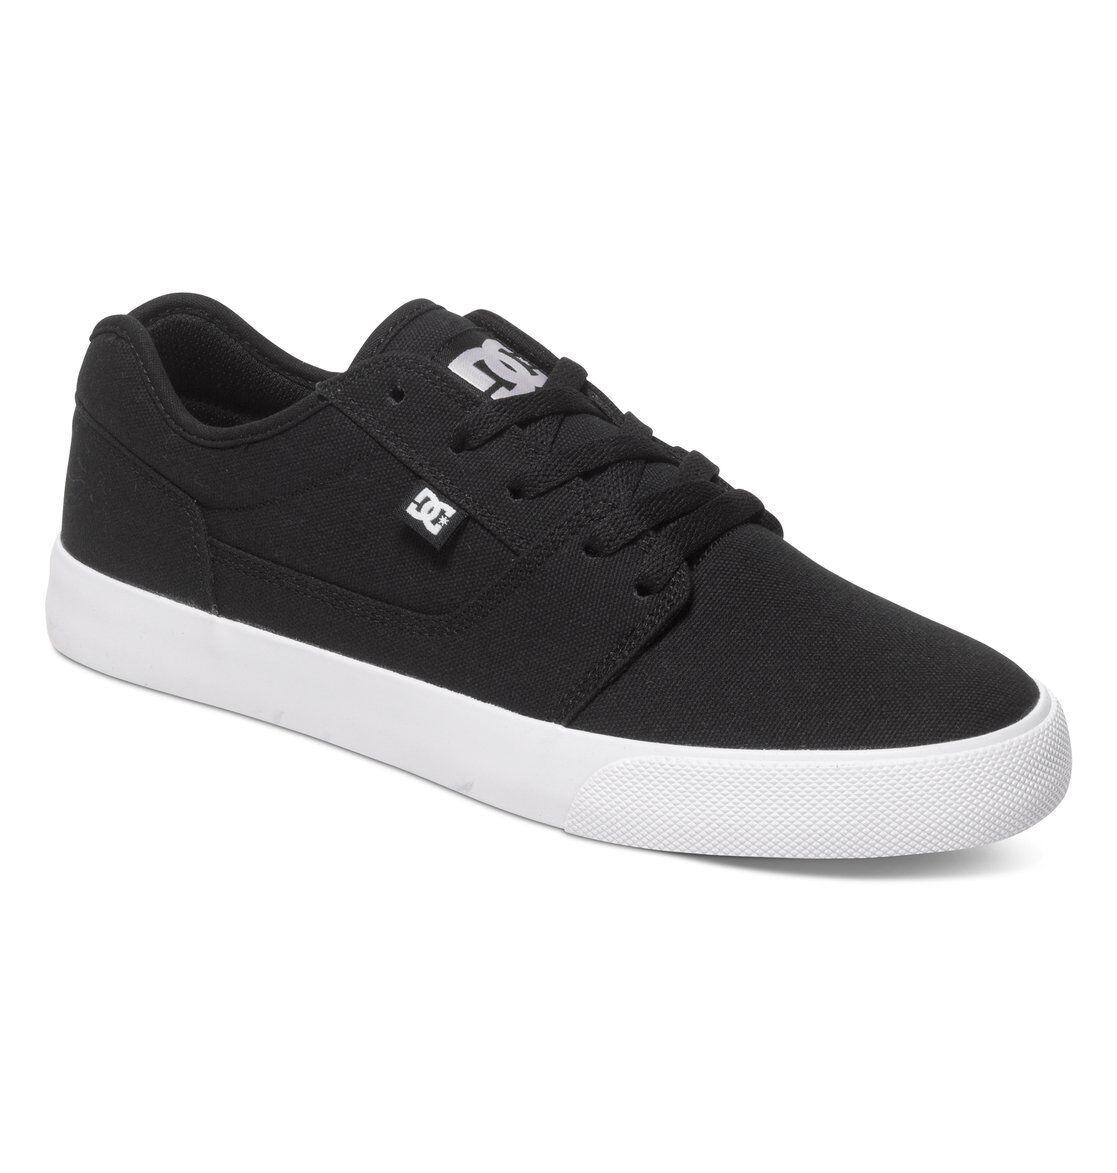 Herrenschuhe Frau skate DC Shoes Tonik TX schwarz black chaussures zapatos